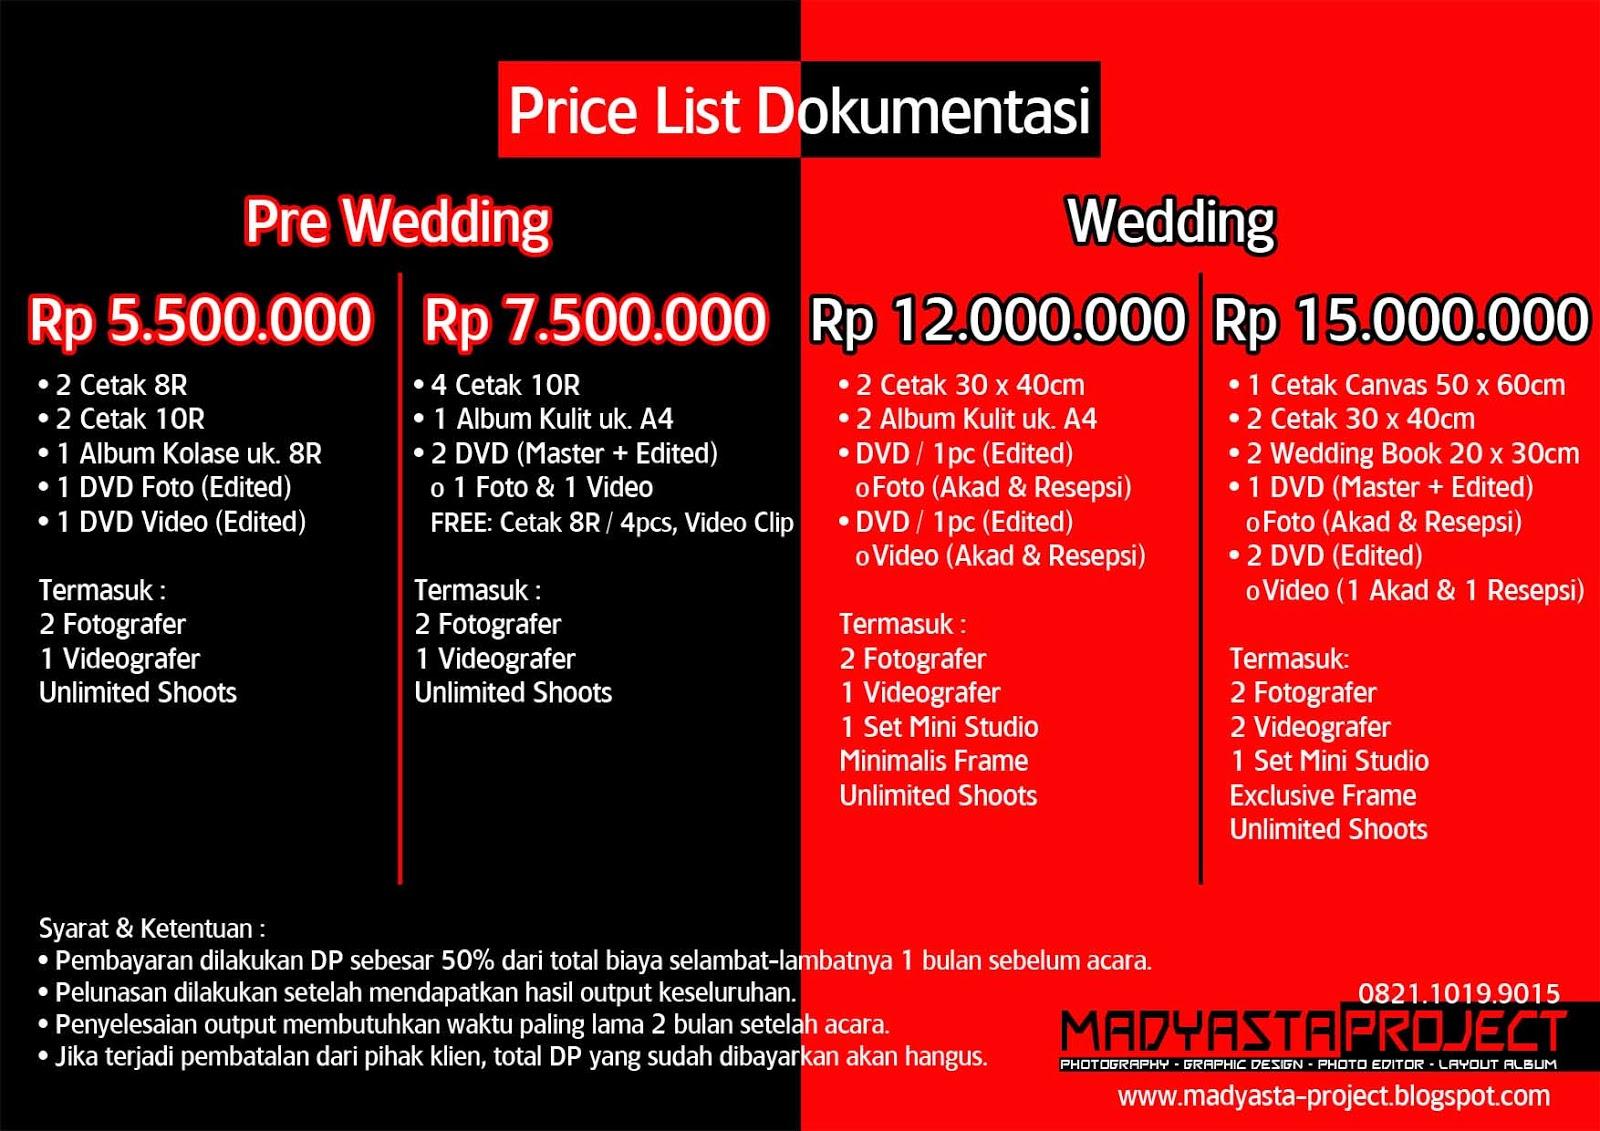 Price List Edit Foto Doentasi